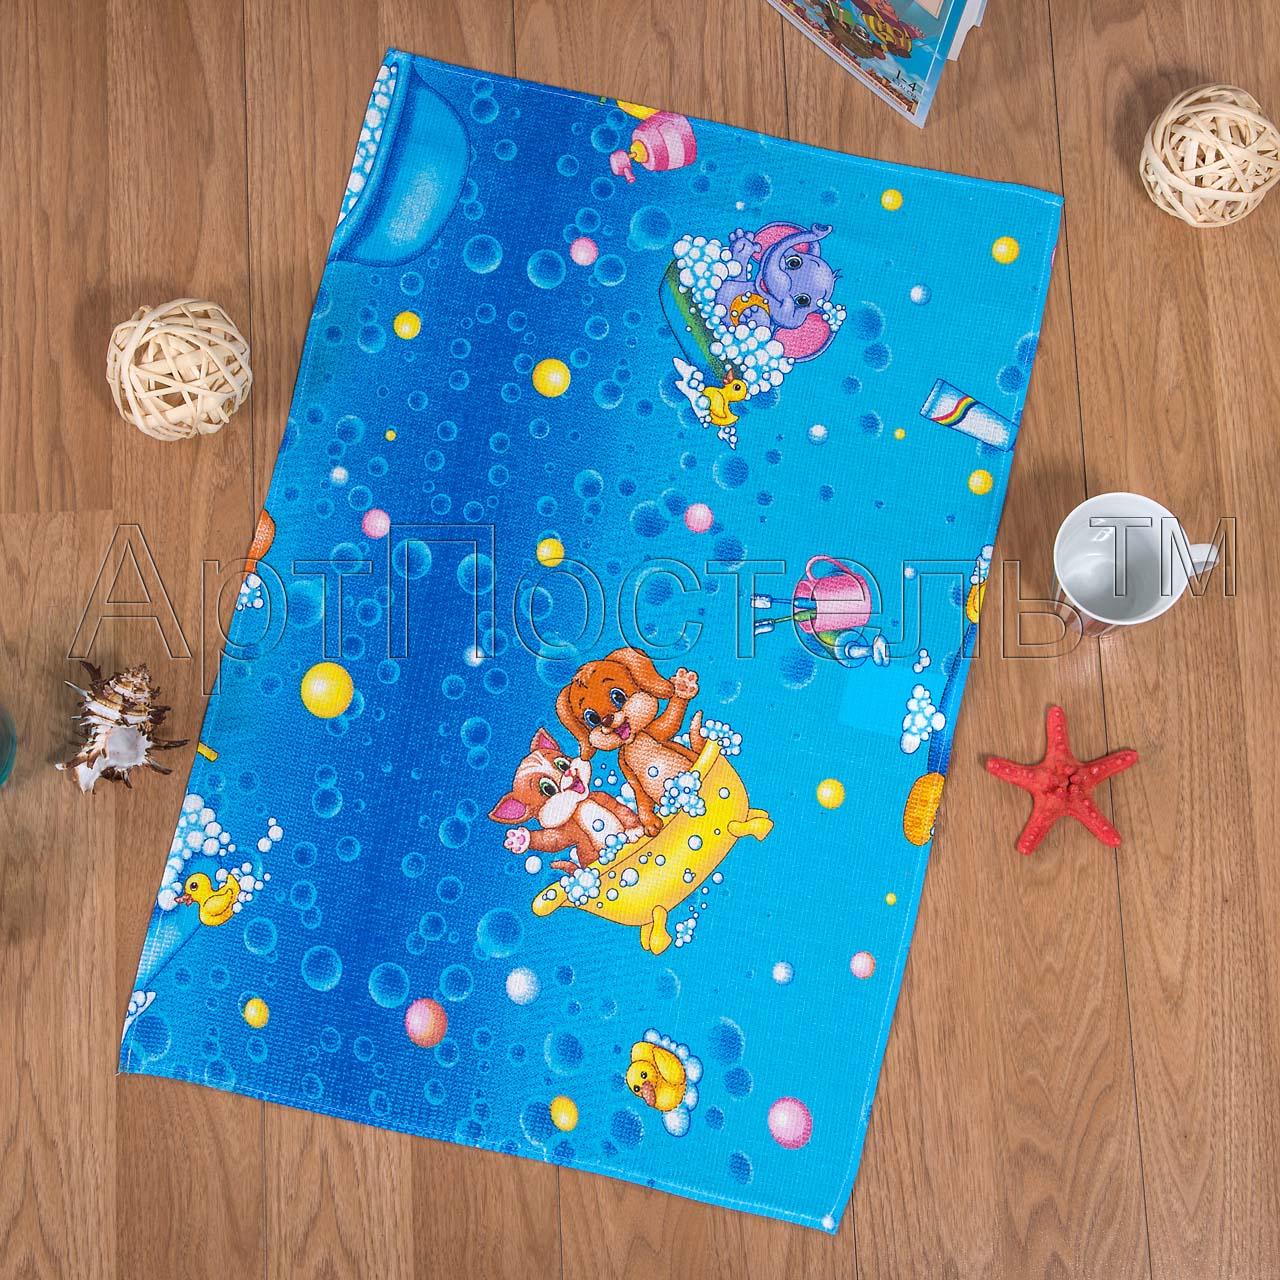 Вафельное полотенце Водные забавы р. 80х150Вафельные полотенца<br>Плотность: 160 г/кв. м<br><br>Тип: Вафельное полотенце<br>Размер: 80х150<br>Материал: Вафельное полотно